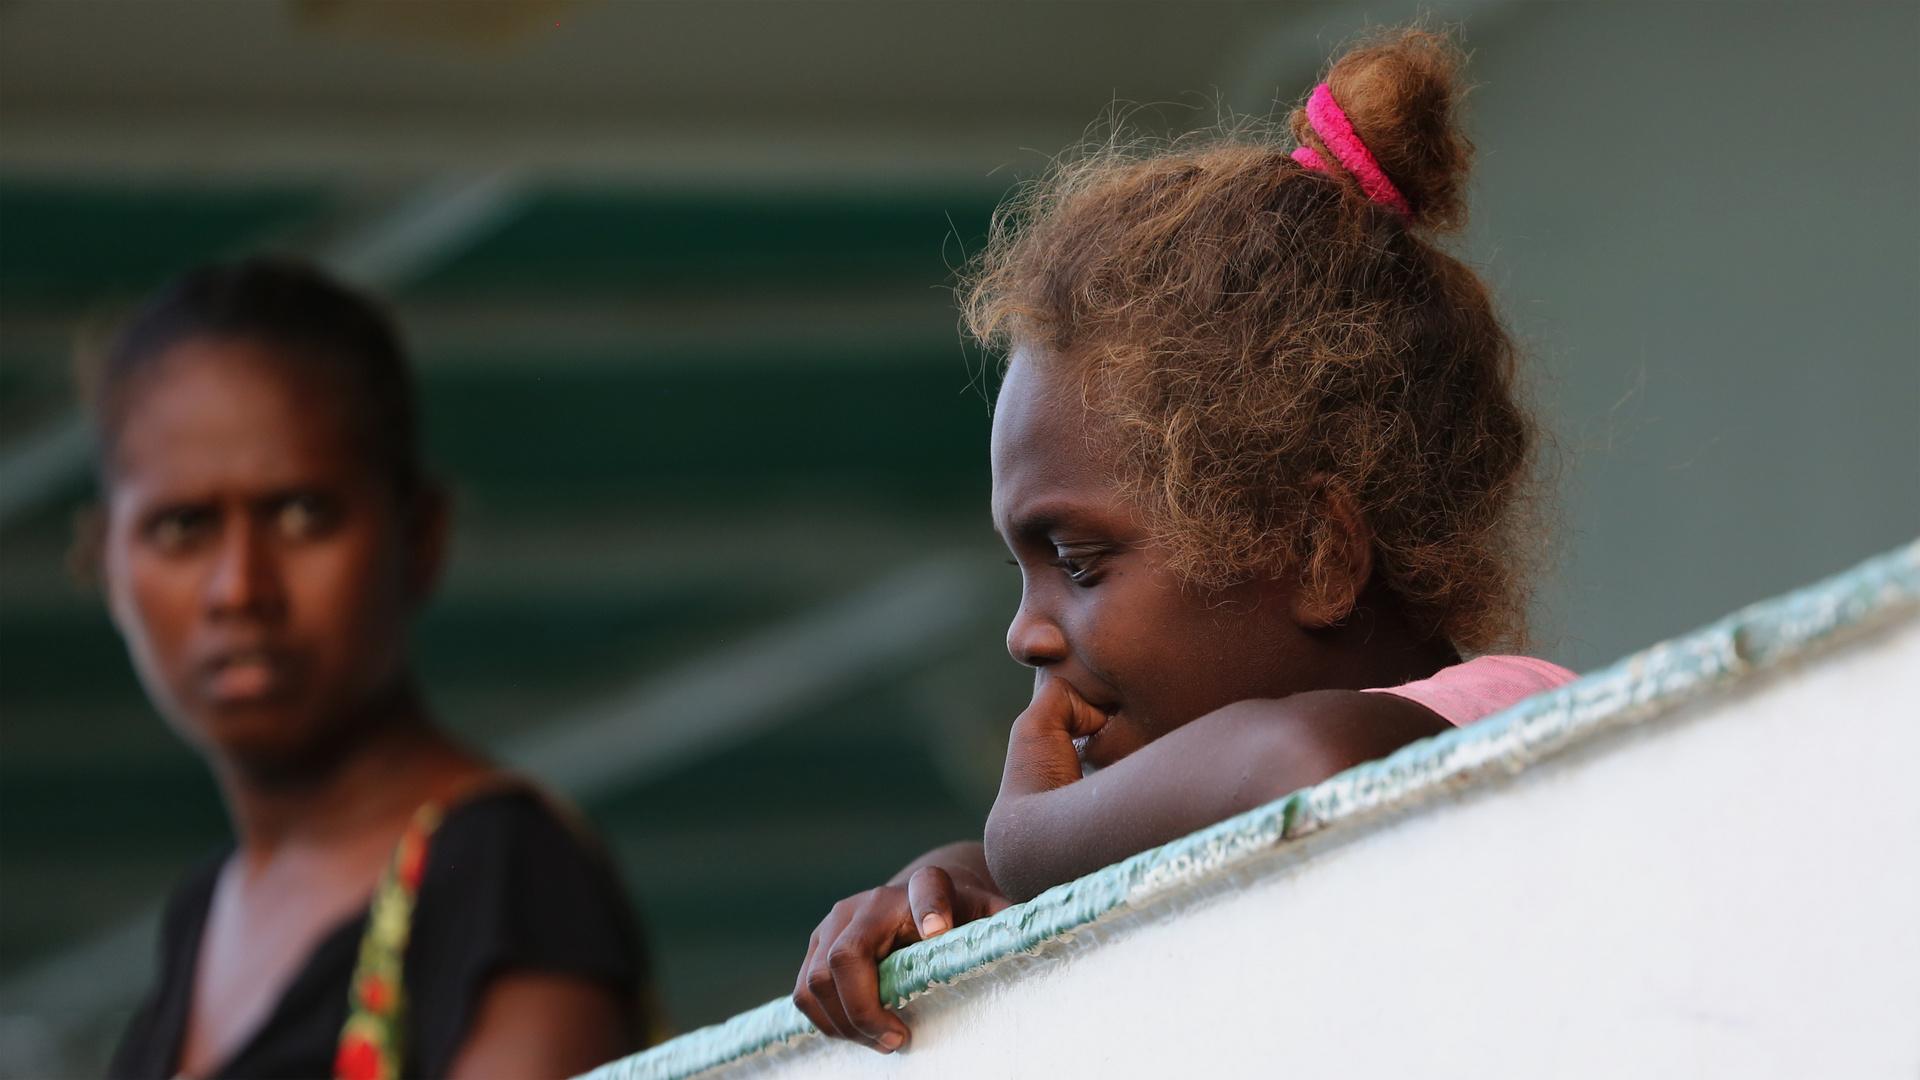 Honiara Faces II, Honiara, Solomon Islands / SB